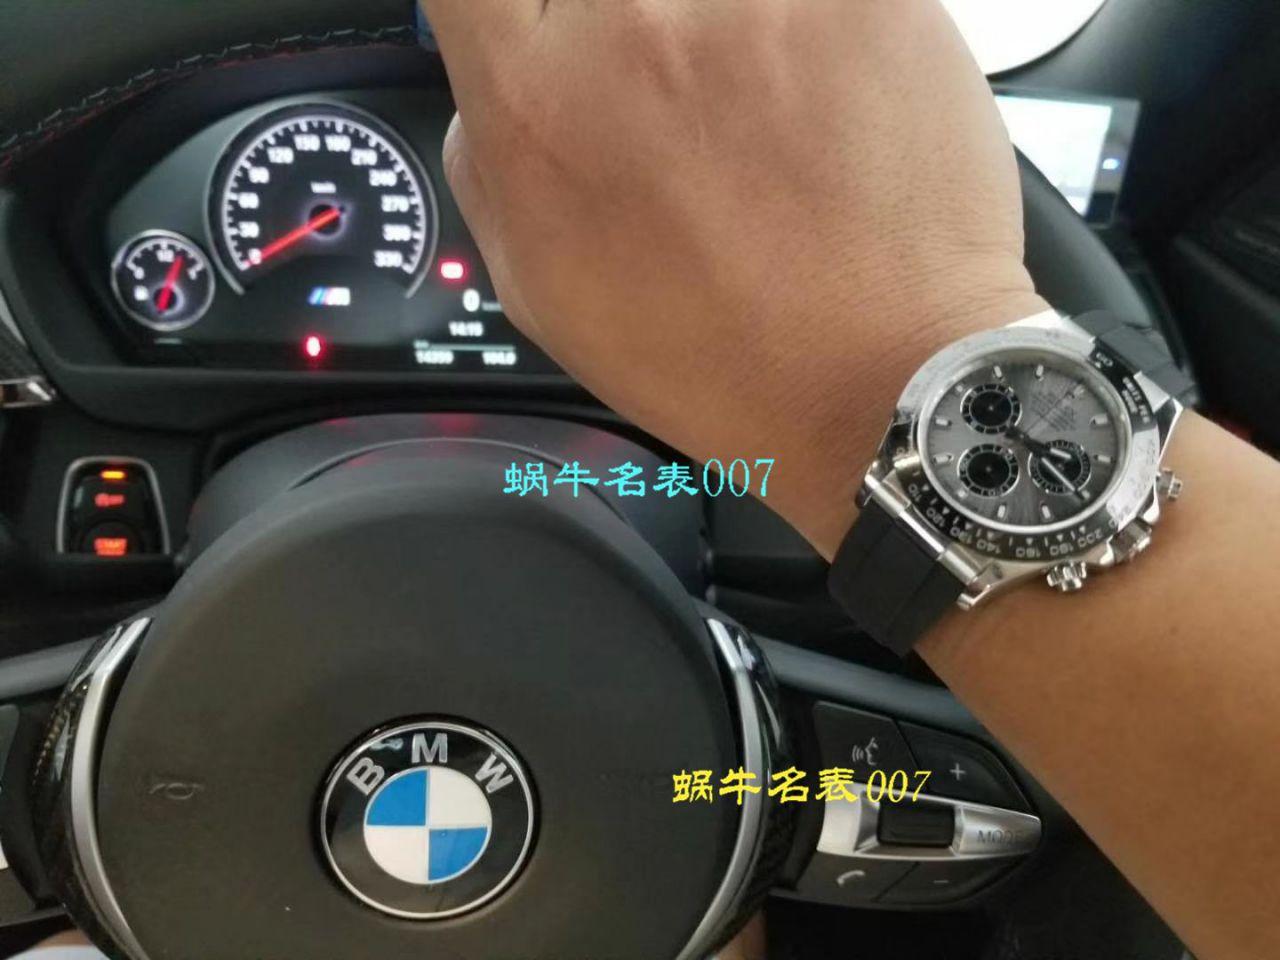 【N厂一比一超A高仿手表】劳力士宇宙计型迪通拿系列116506-78596冰蓝盘棕色计时外圈腕表 / R236